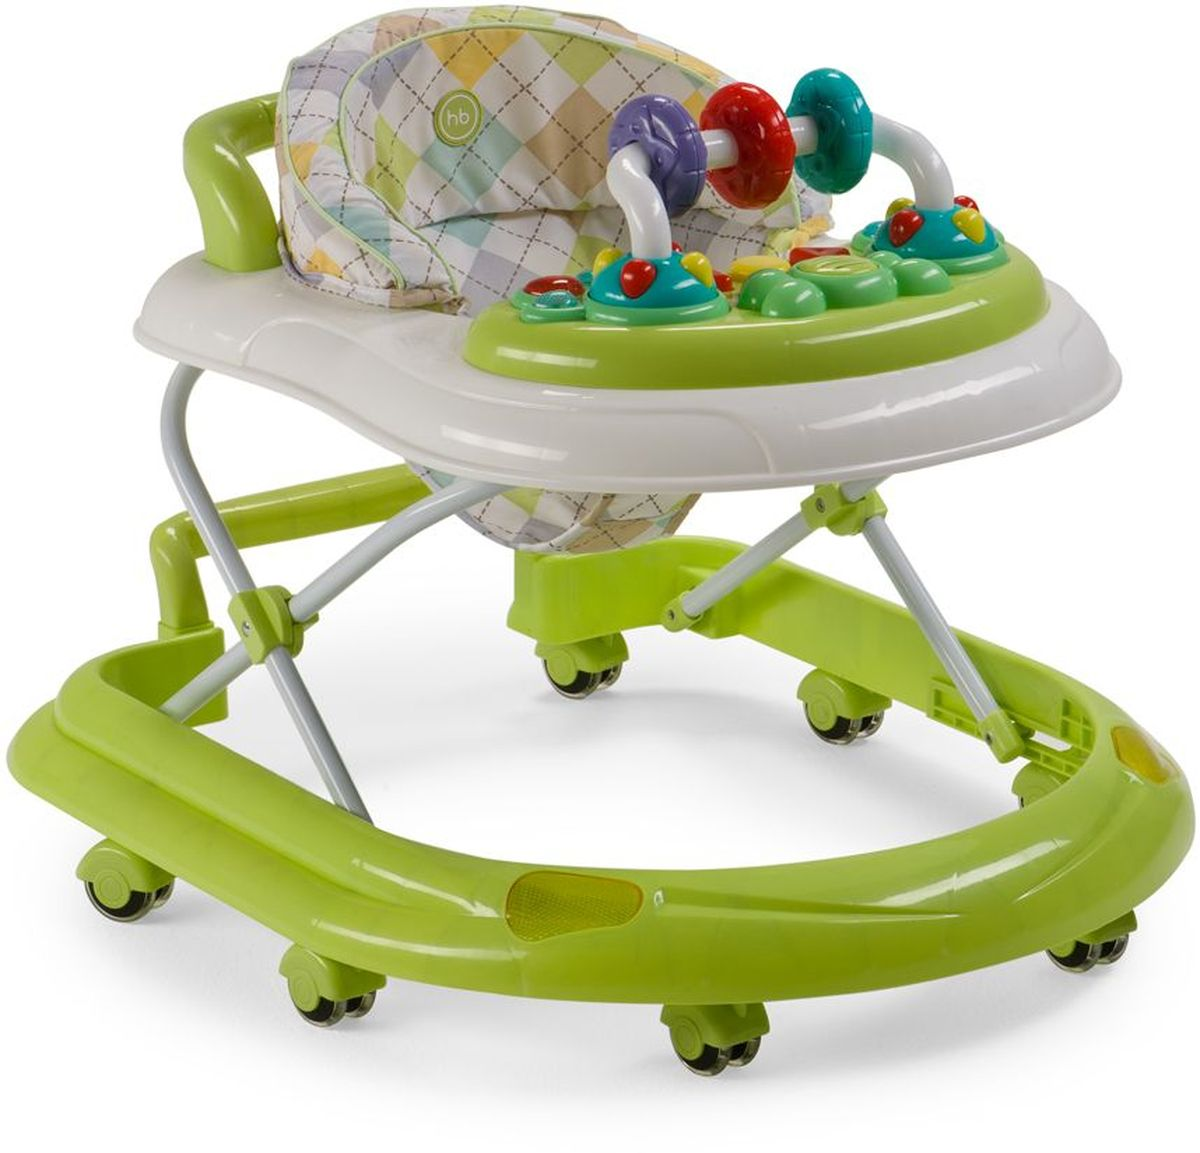 Happy Baby Ходунки Smiley V2 цвет зеленый -  Ходунки, прыгунки, качалки